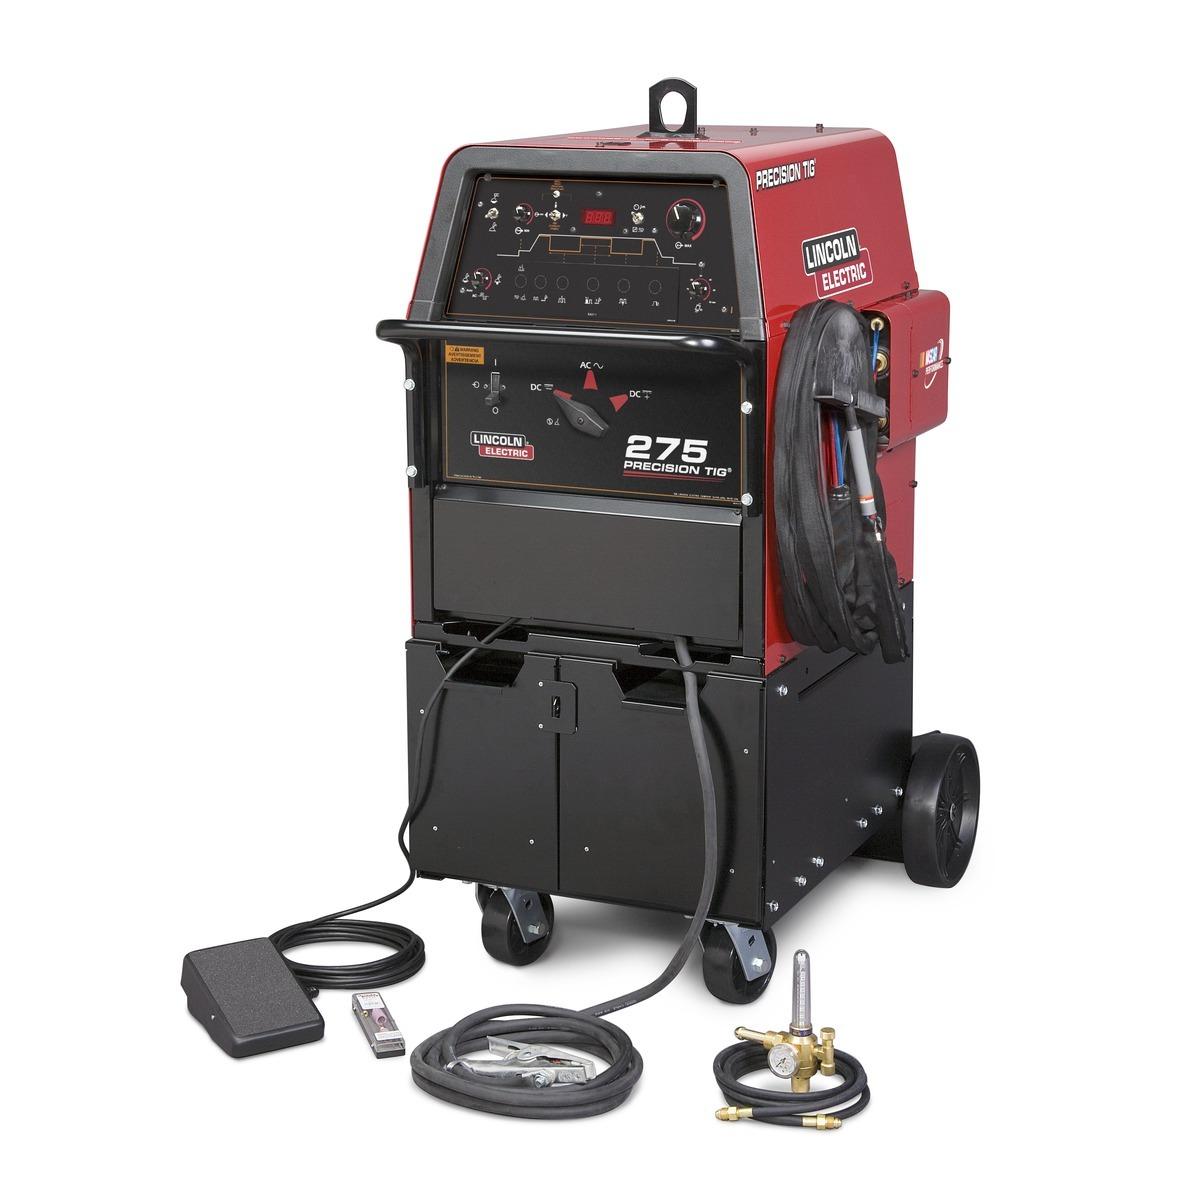 Airgas Lincoln Stick Welder Electric Precision Tig 275 Ready Pak 208